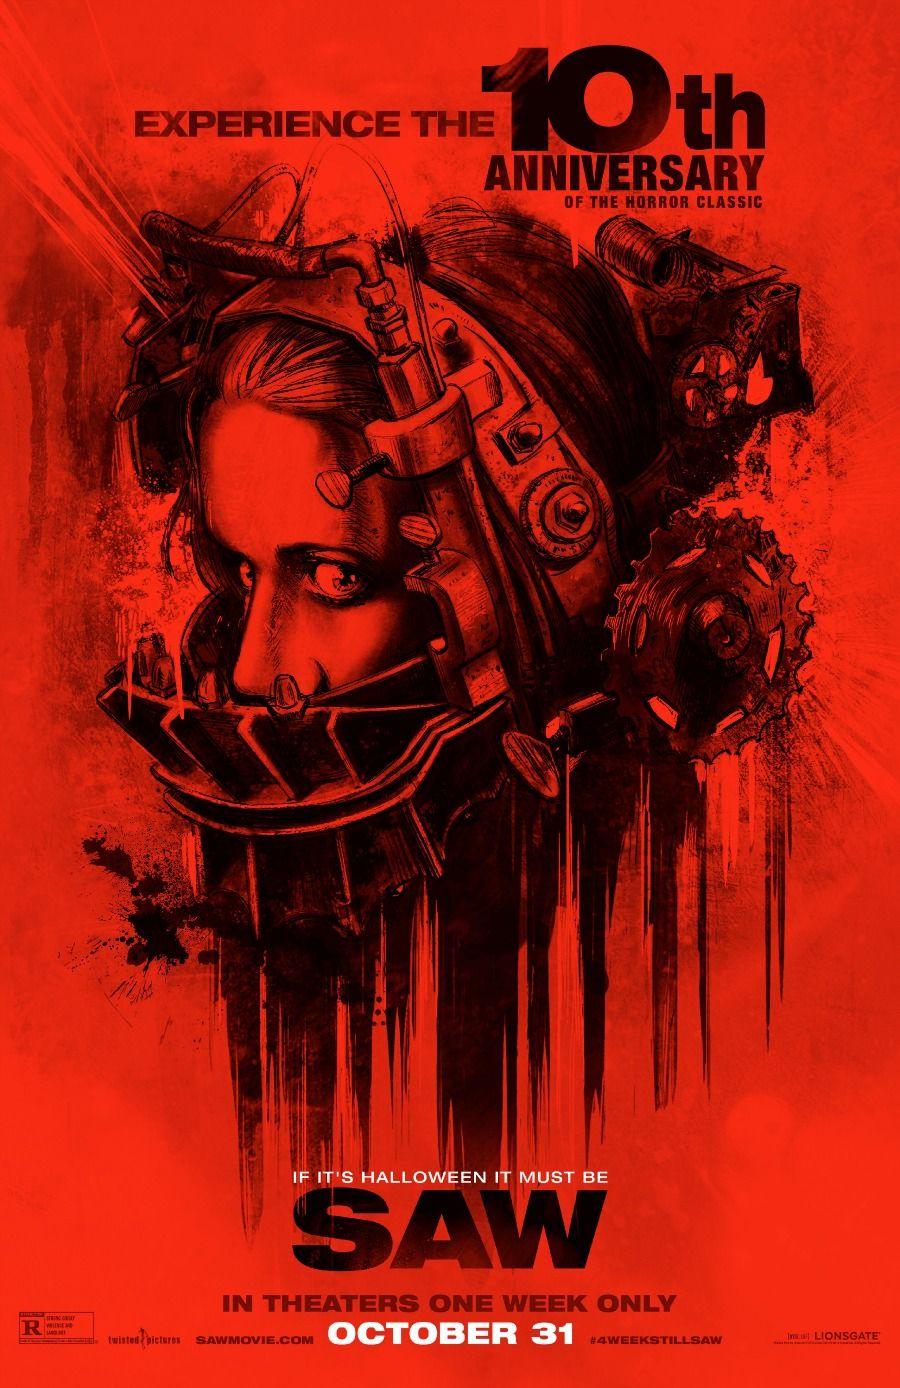 10th Anniversary #Saw Re-Release Poster & Trailer - https://www.youtube.com/watch?v=xDoxuZzhrnw